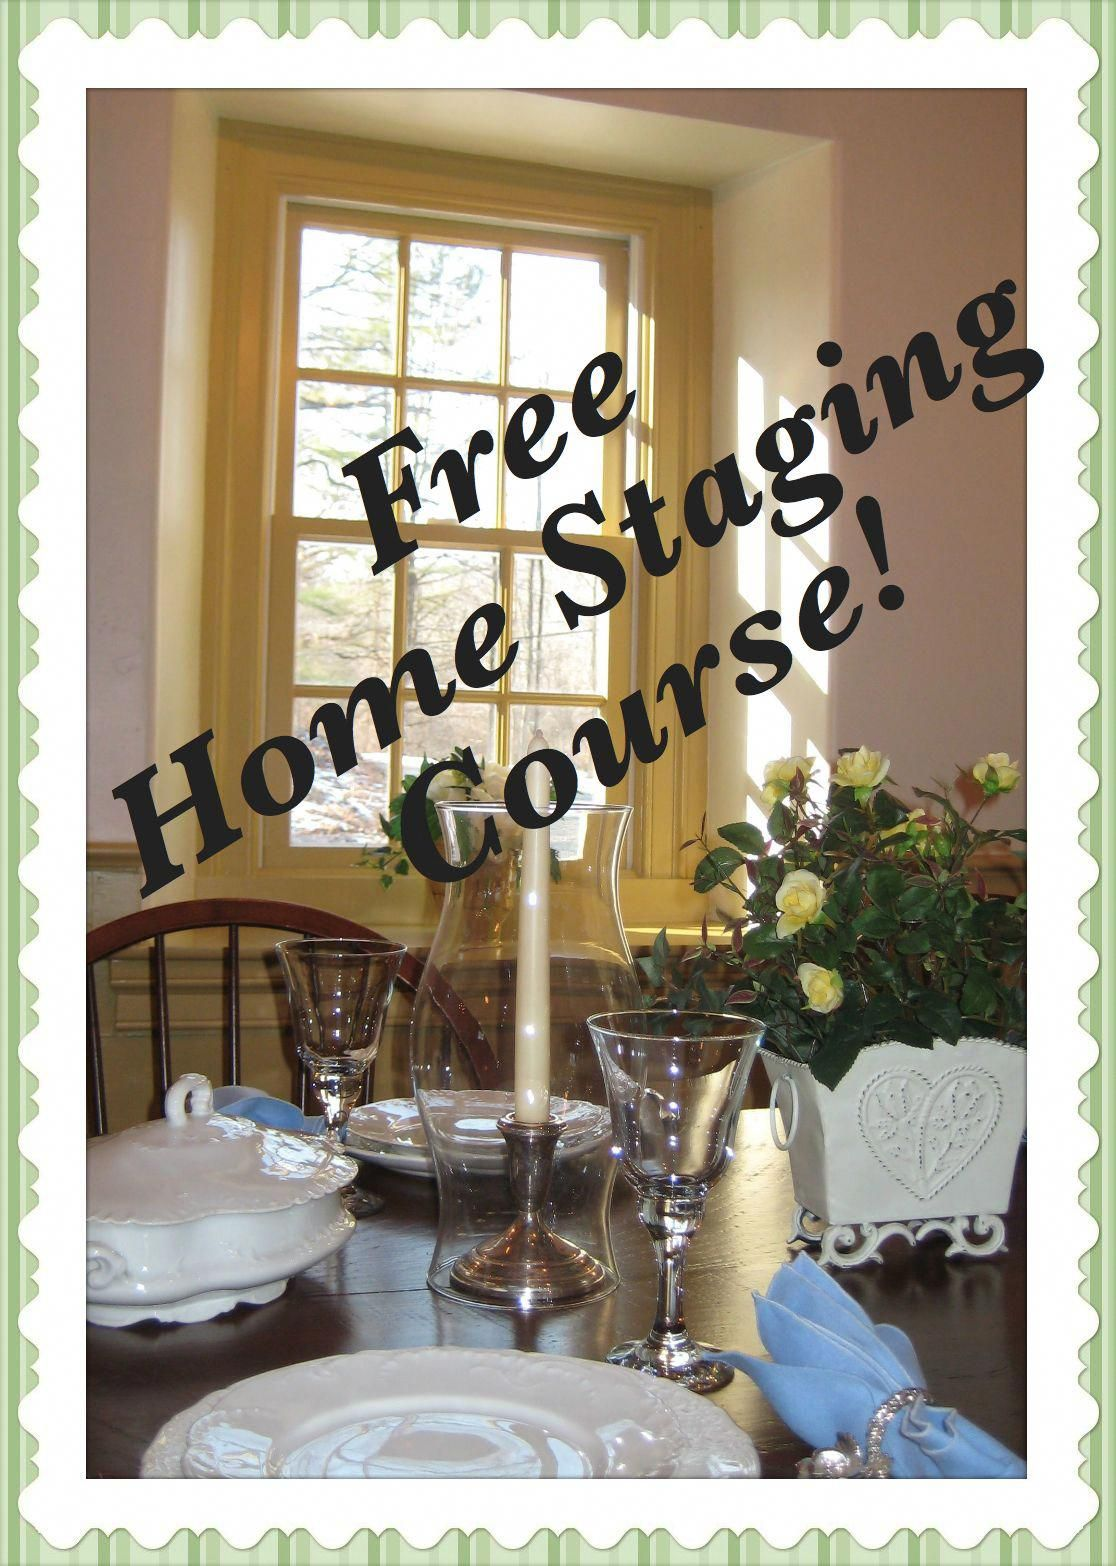 Free home staging course interiordesigncourses also interior design rh pinterest